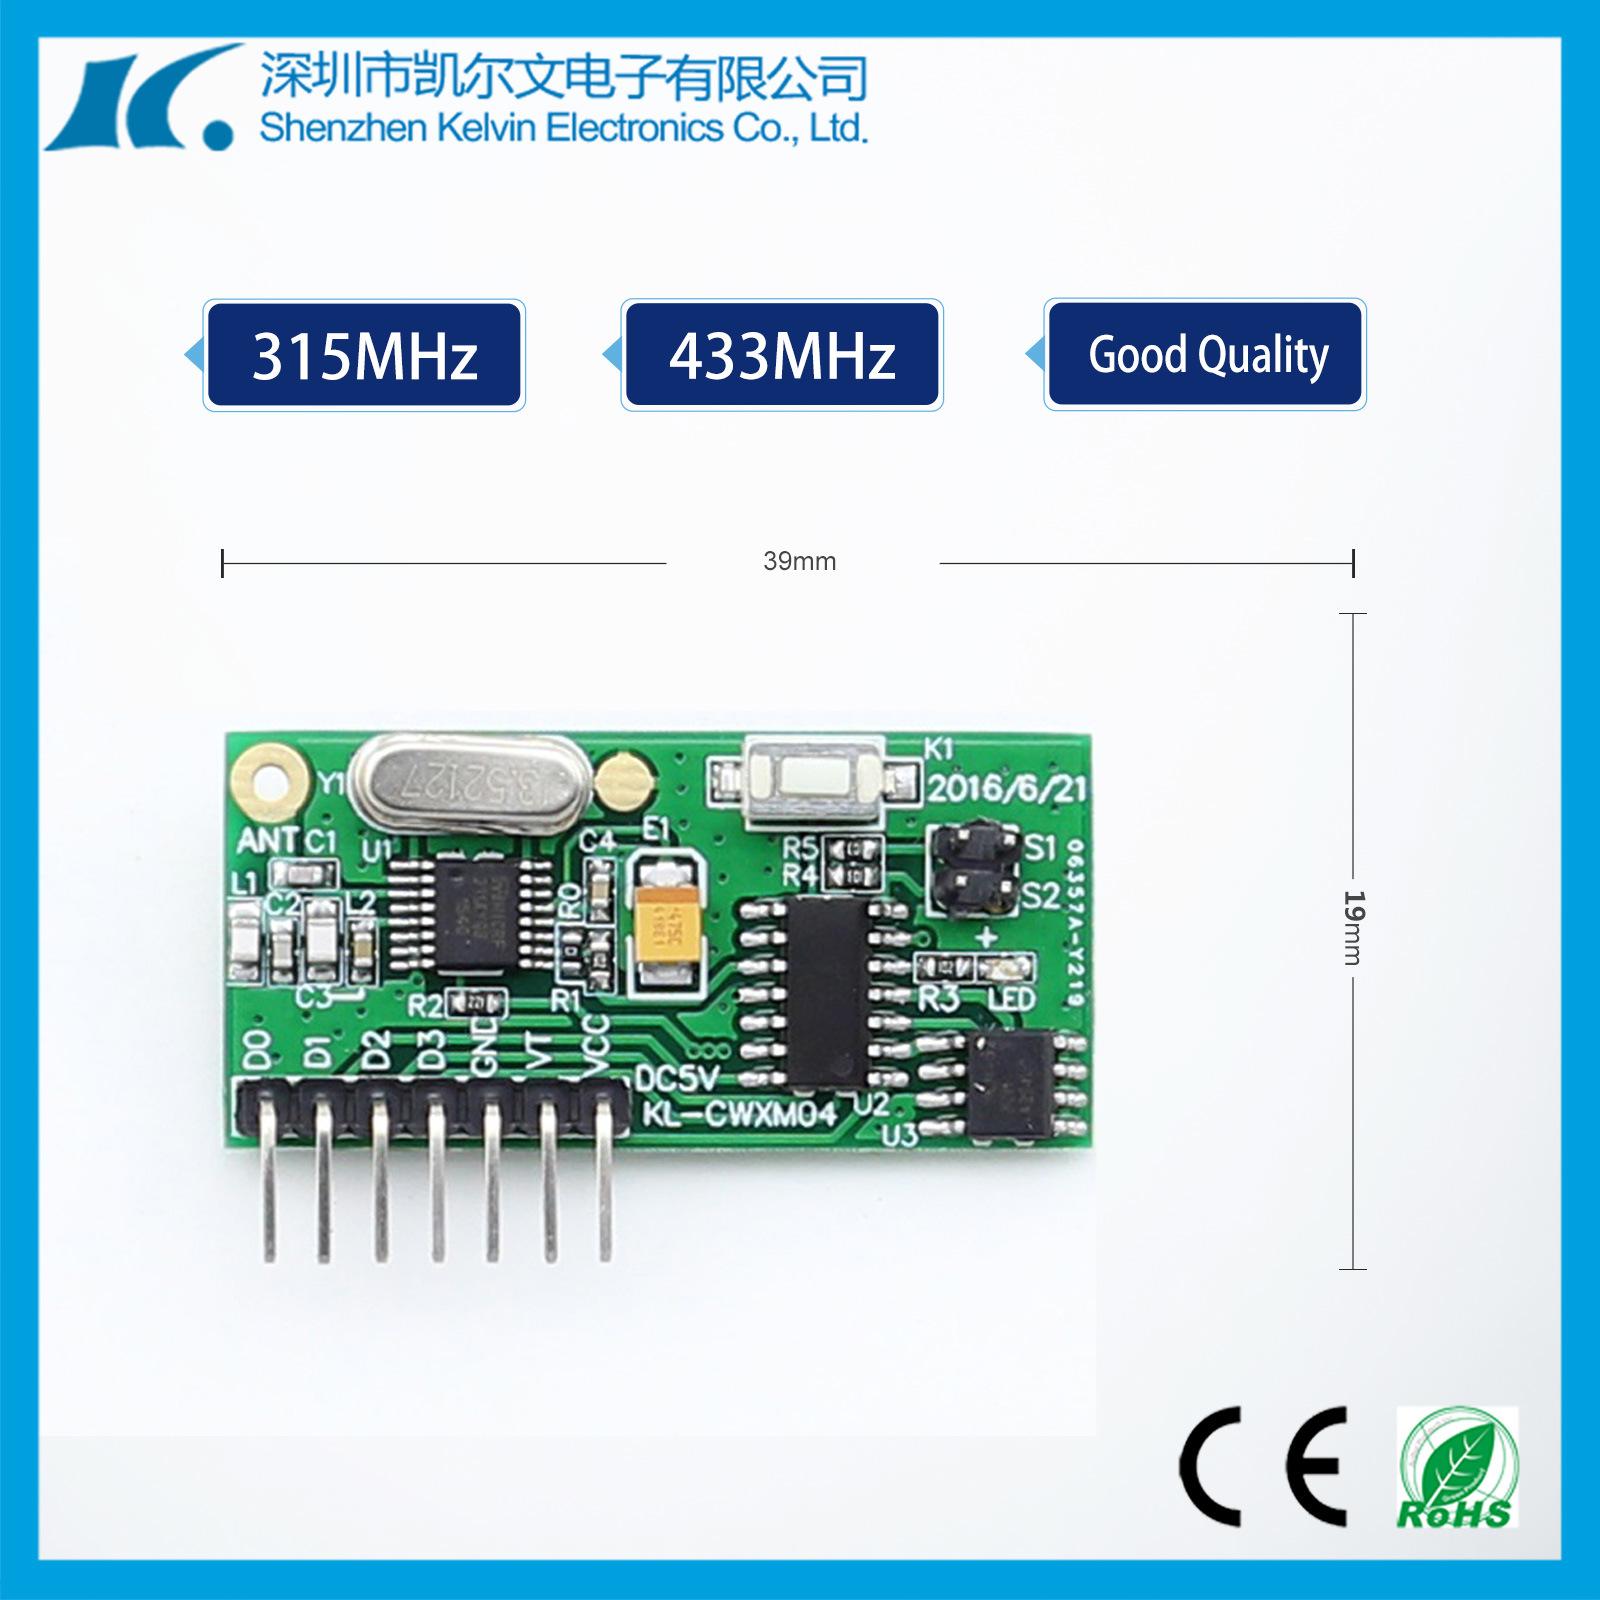 Super Heterodyne High Sensitivity RF Receiver Module Kl-Cwxm04